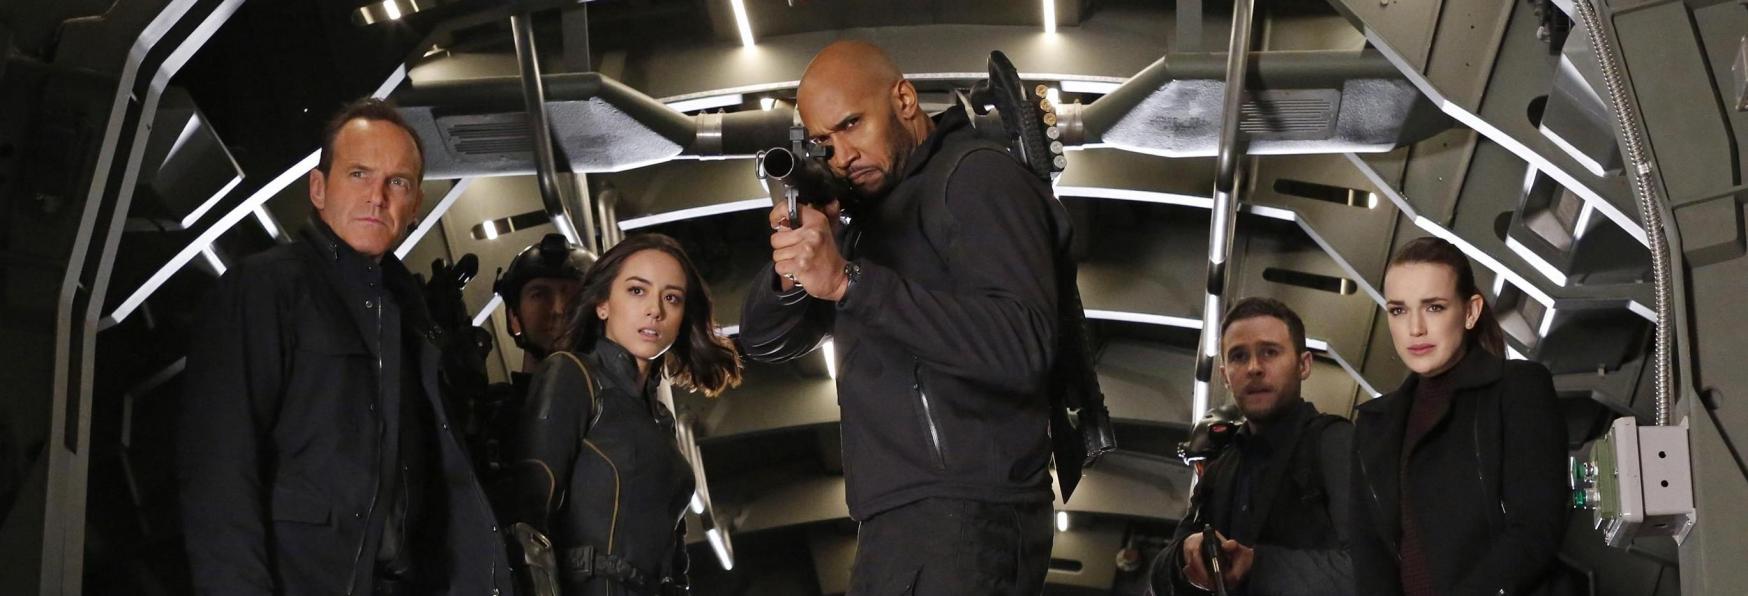 Agents of S.H.I.E.L.D. - Uno Spin-off della Serie TV? I Produttori rispondono ai Rumor